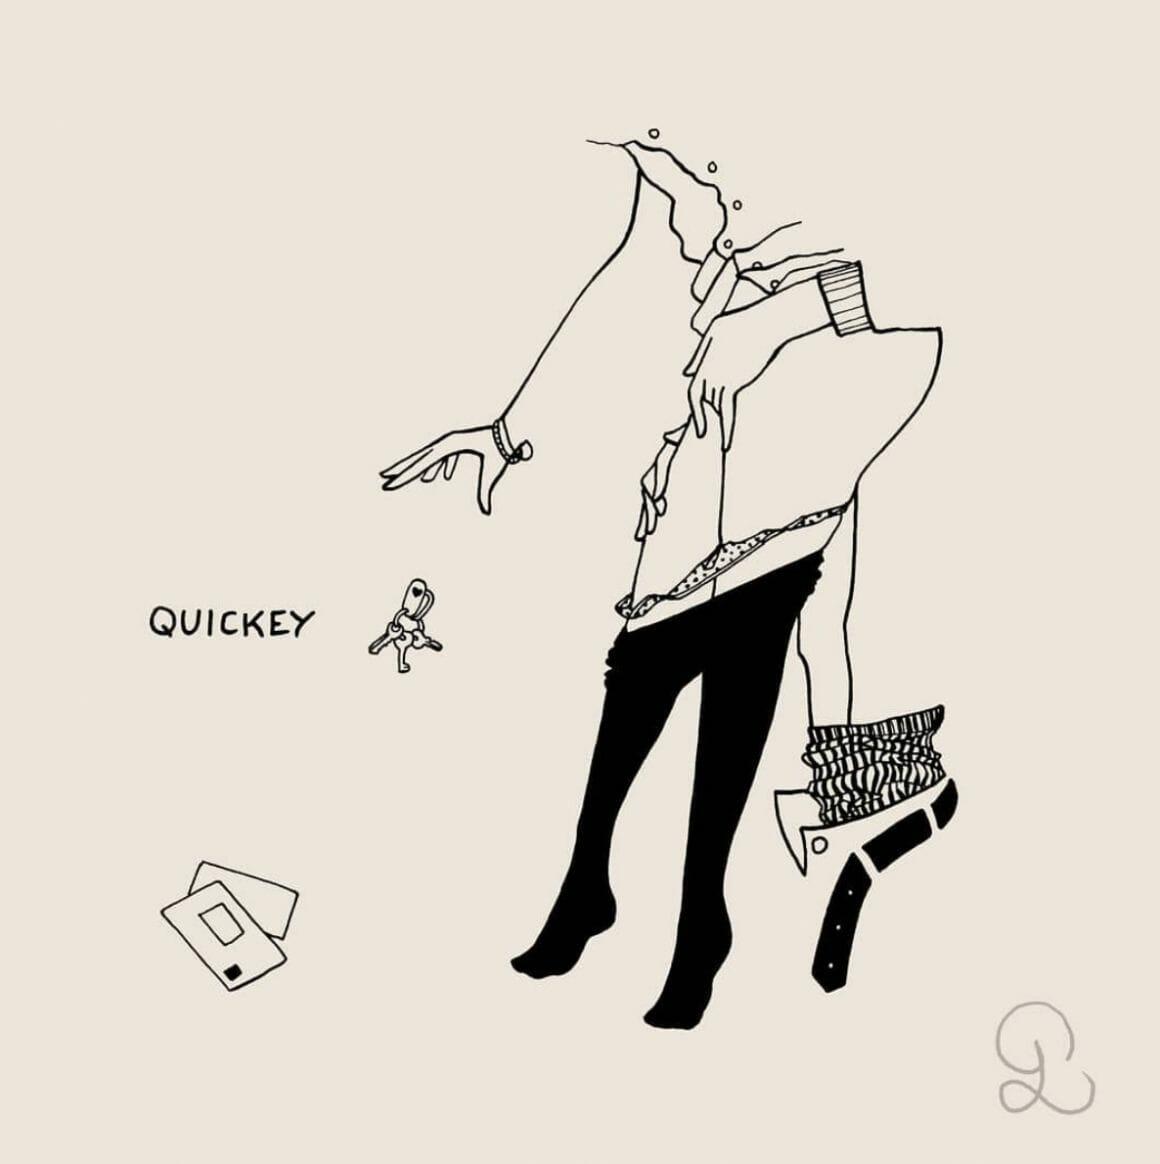 Quickey par Petites Luxures